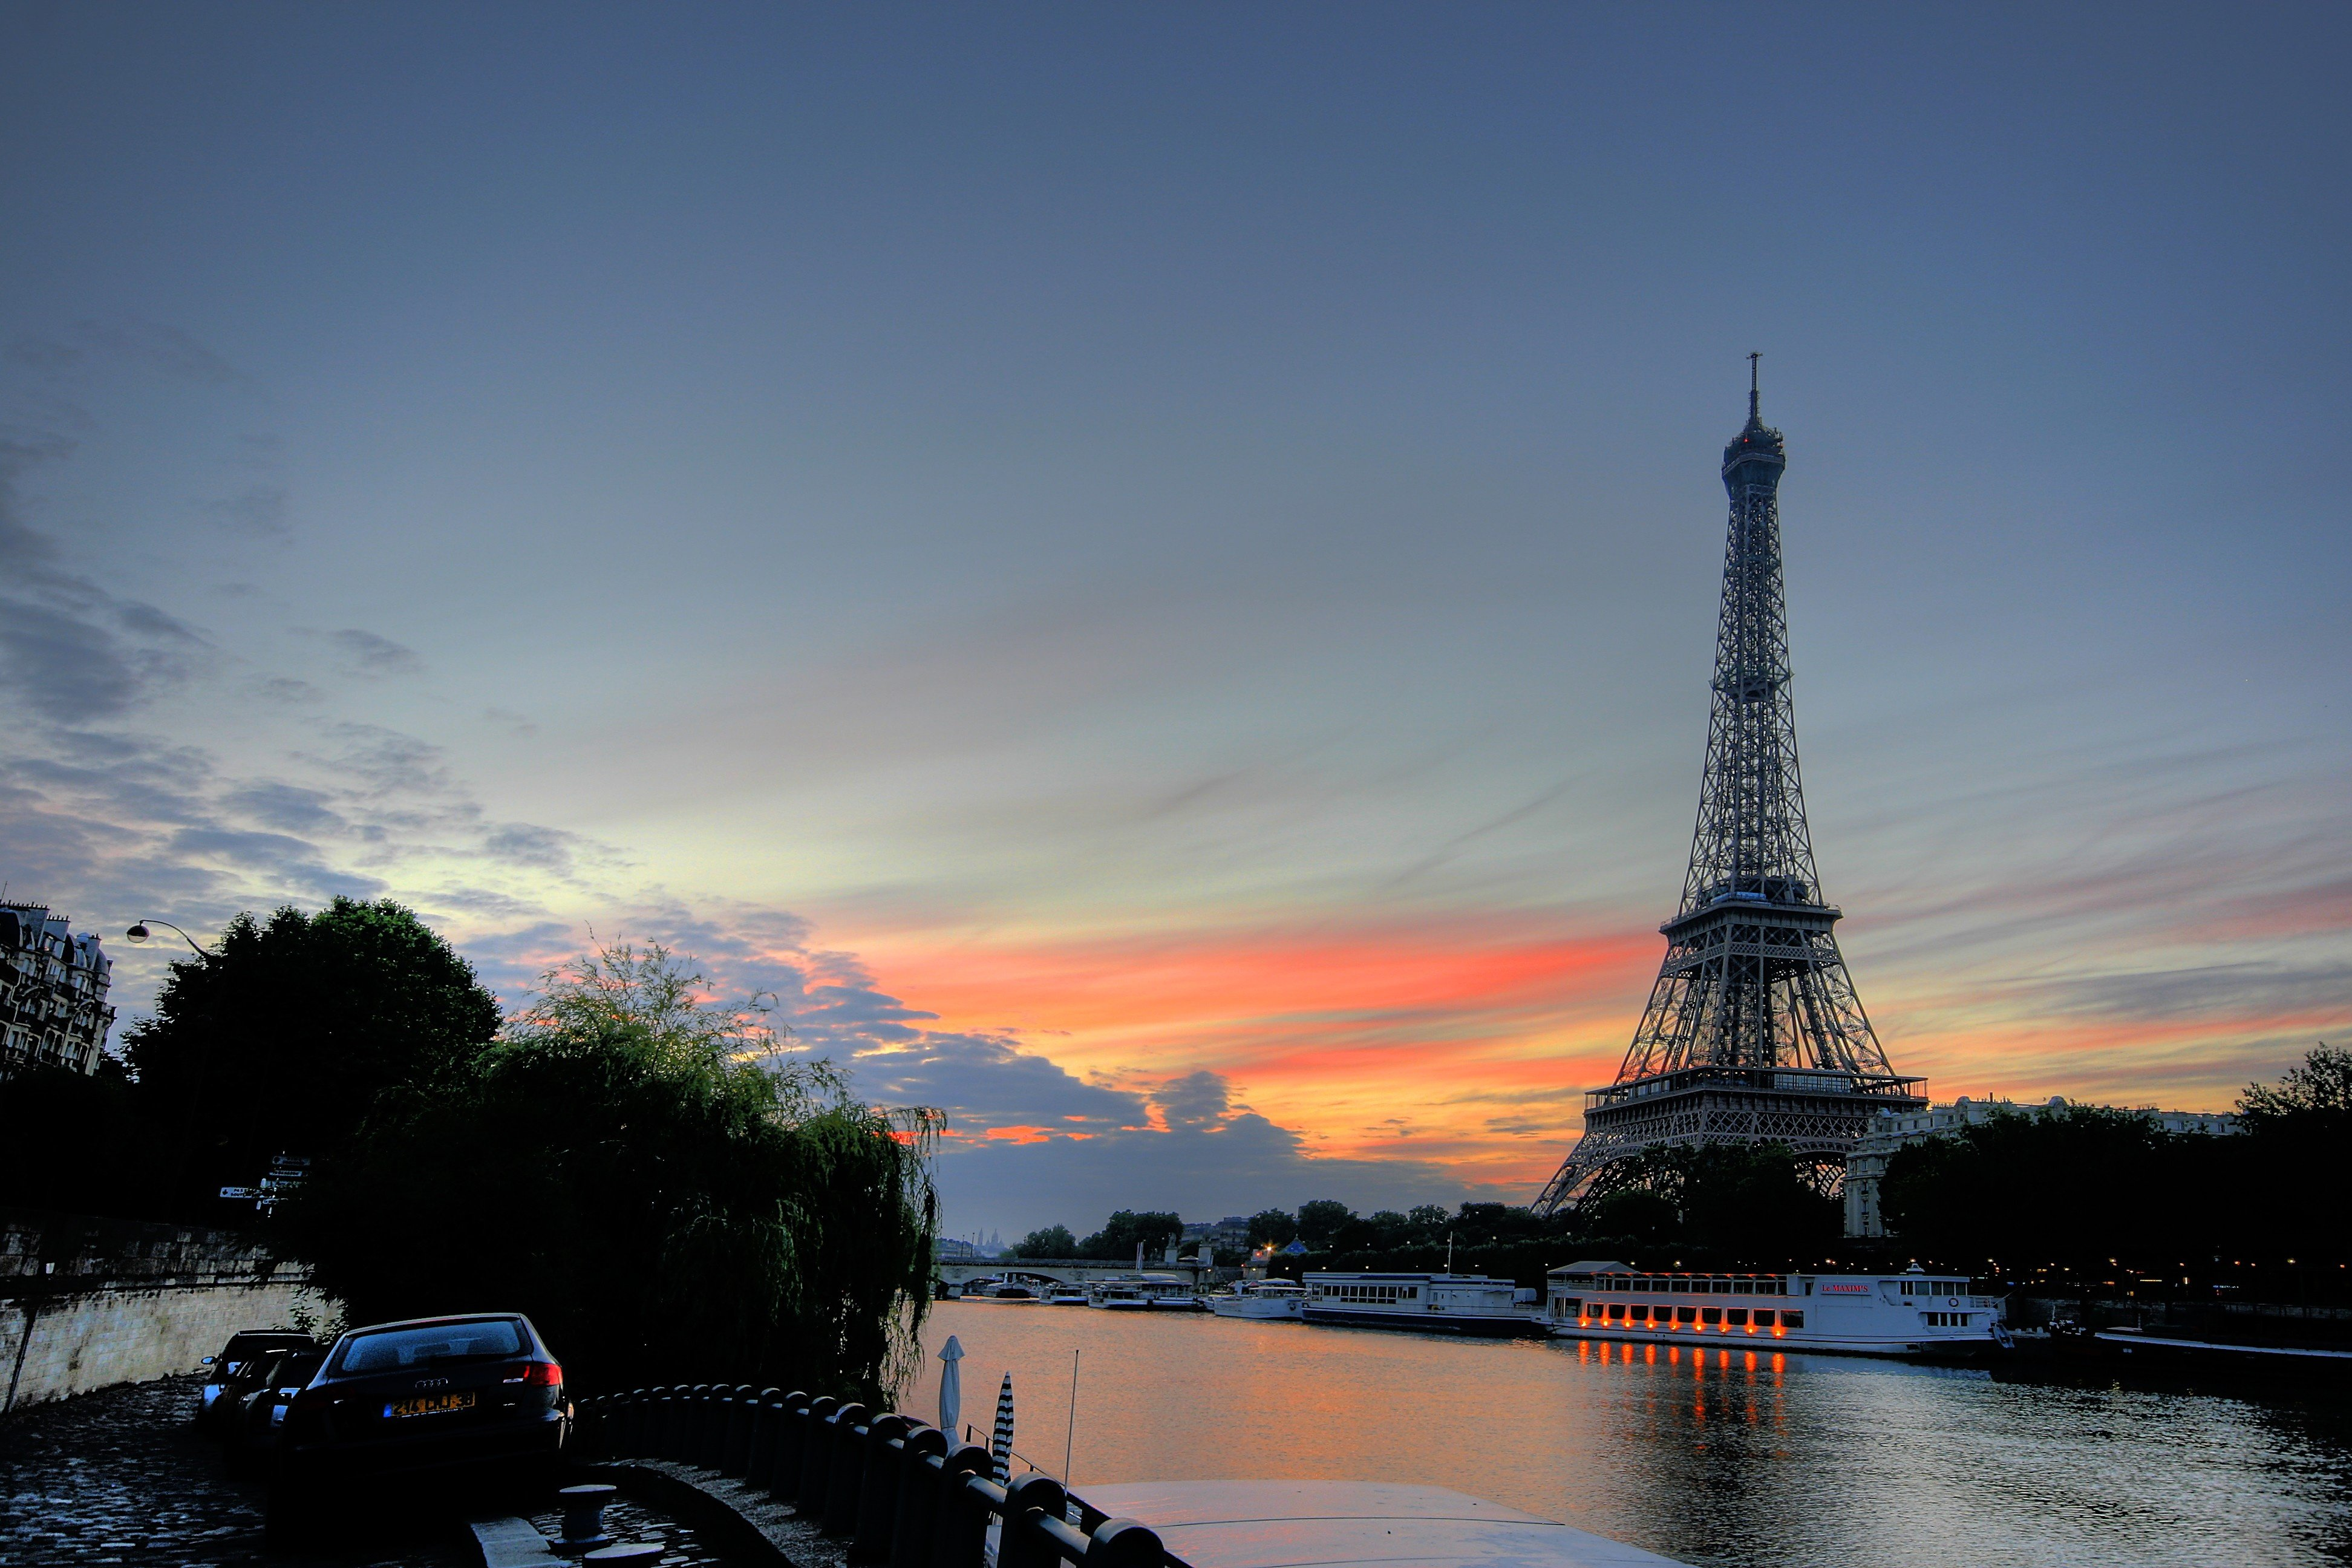 Top Wallpaper Macbook Paris - 2f1ff42b3b0bafeba20dfe3f23fac777  Snapshot_752793.jpg